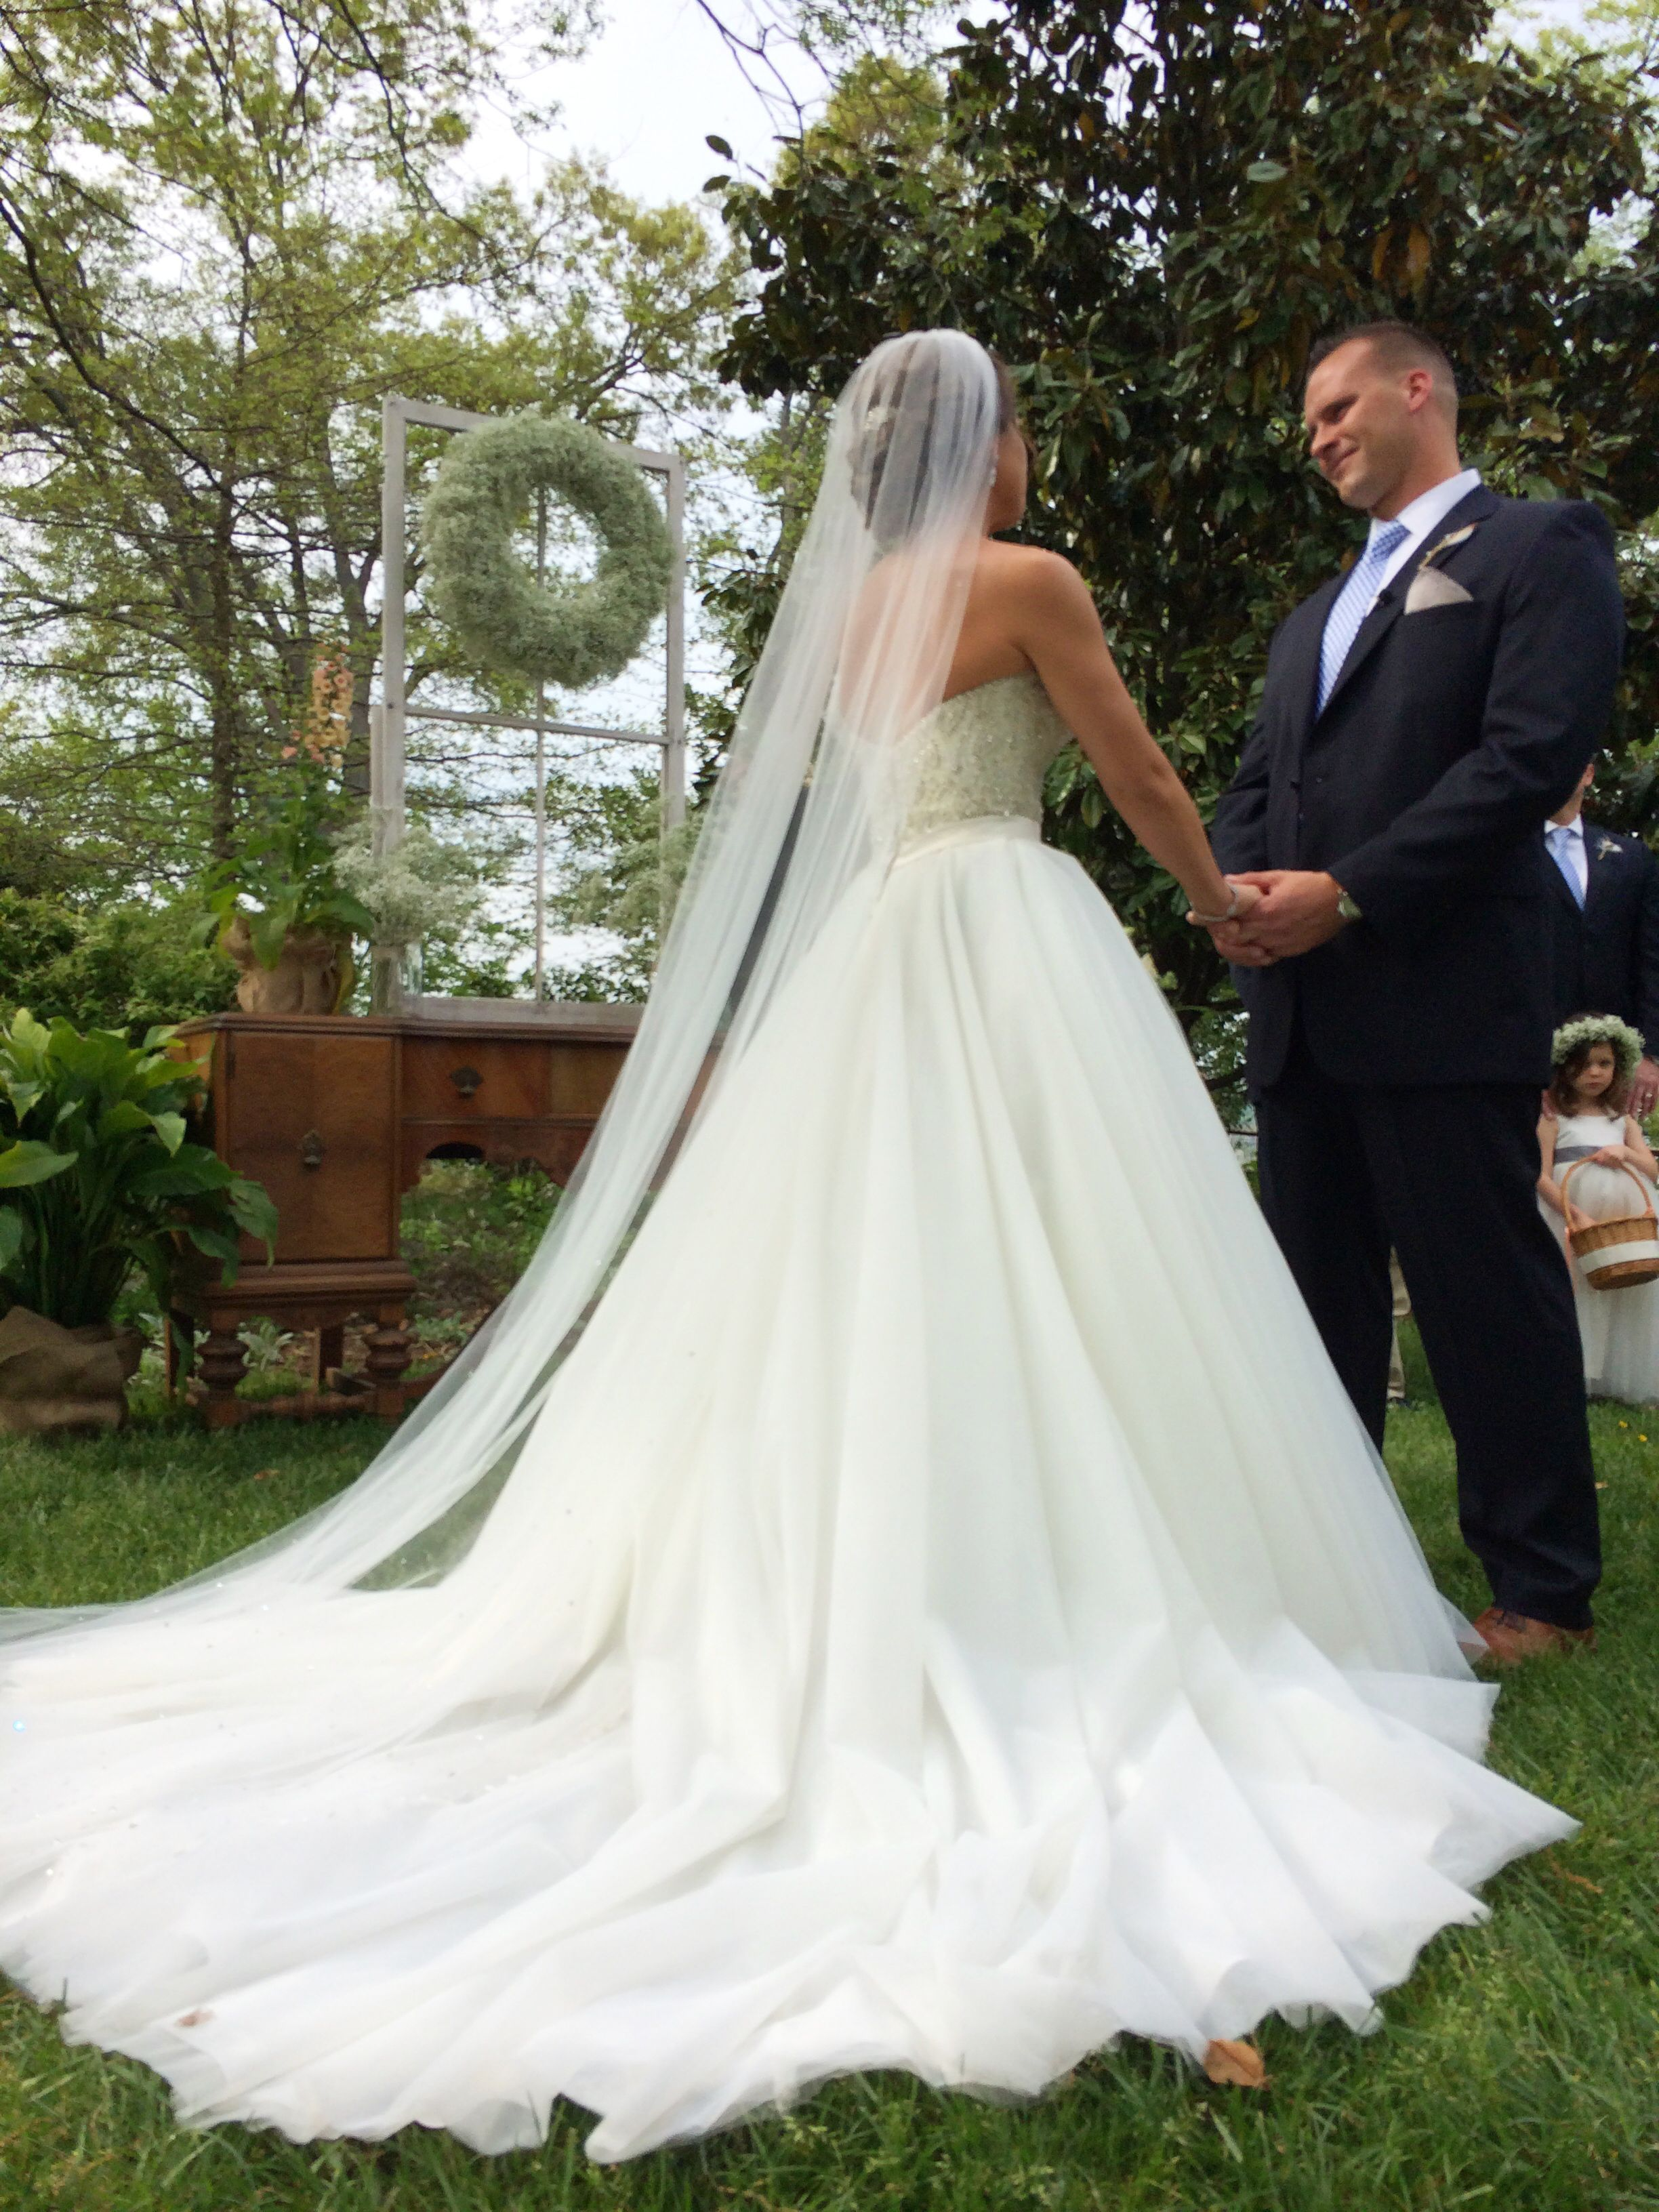 Allure Bridal Princess Wedding Dress Long Train Veil Sparkly Perfection Garden Outdoor Ballgown